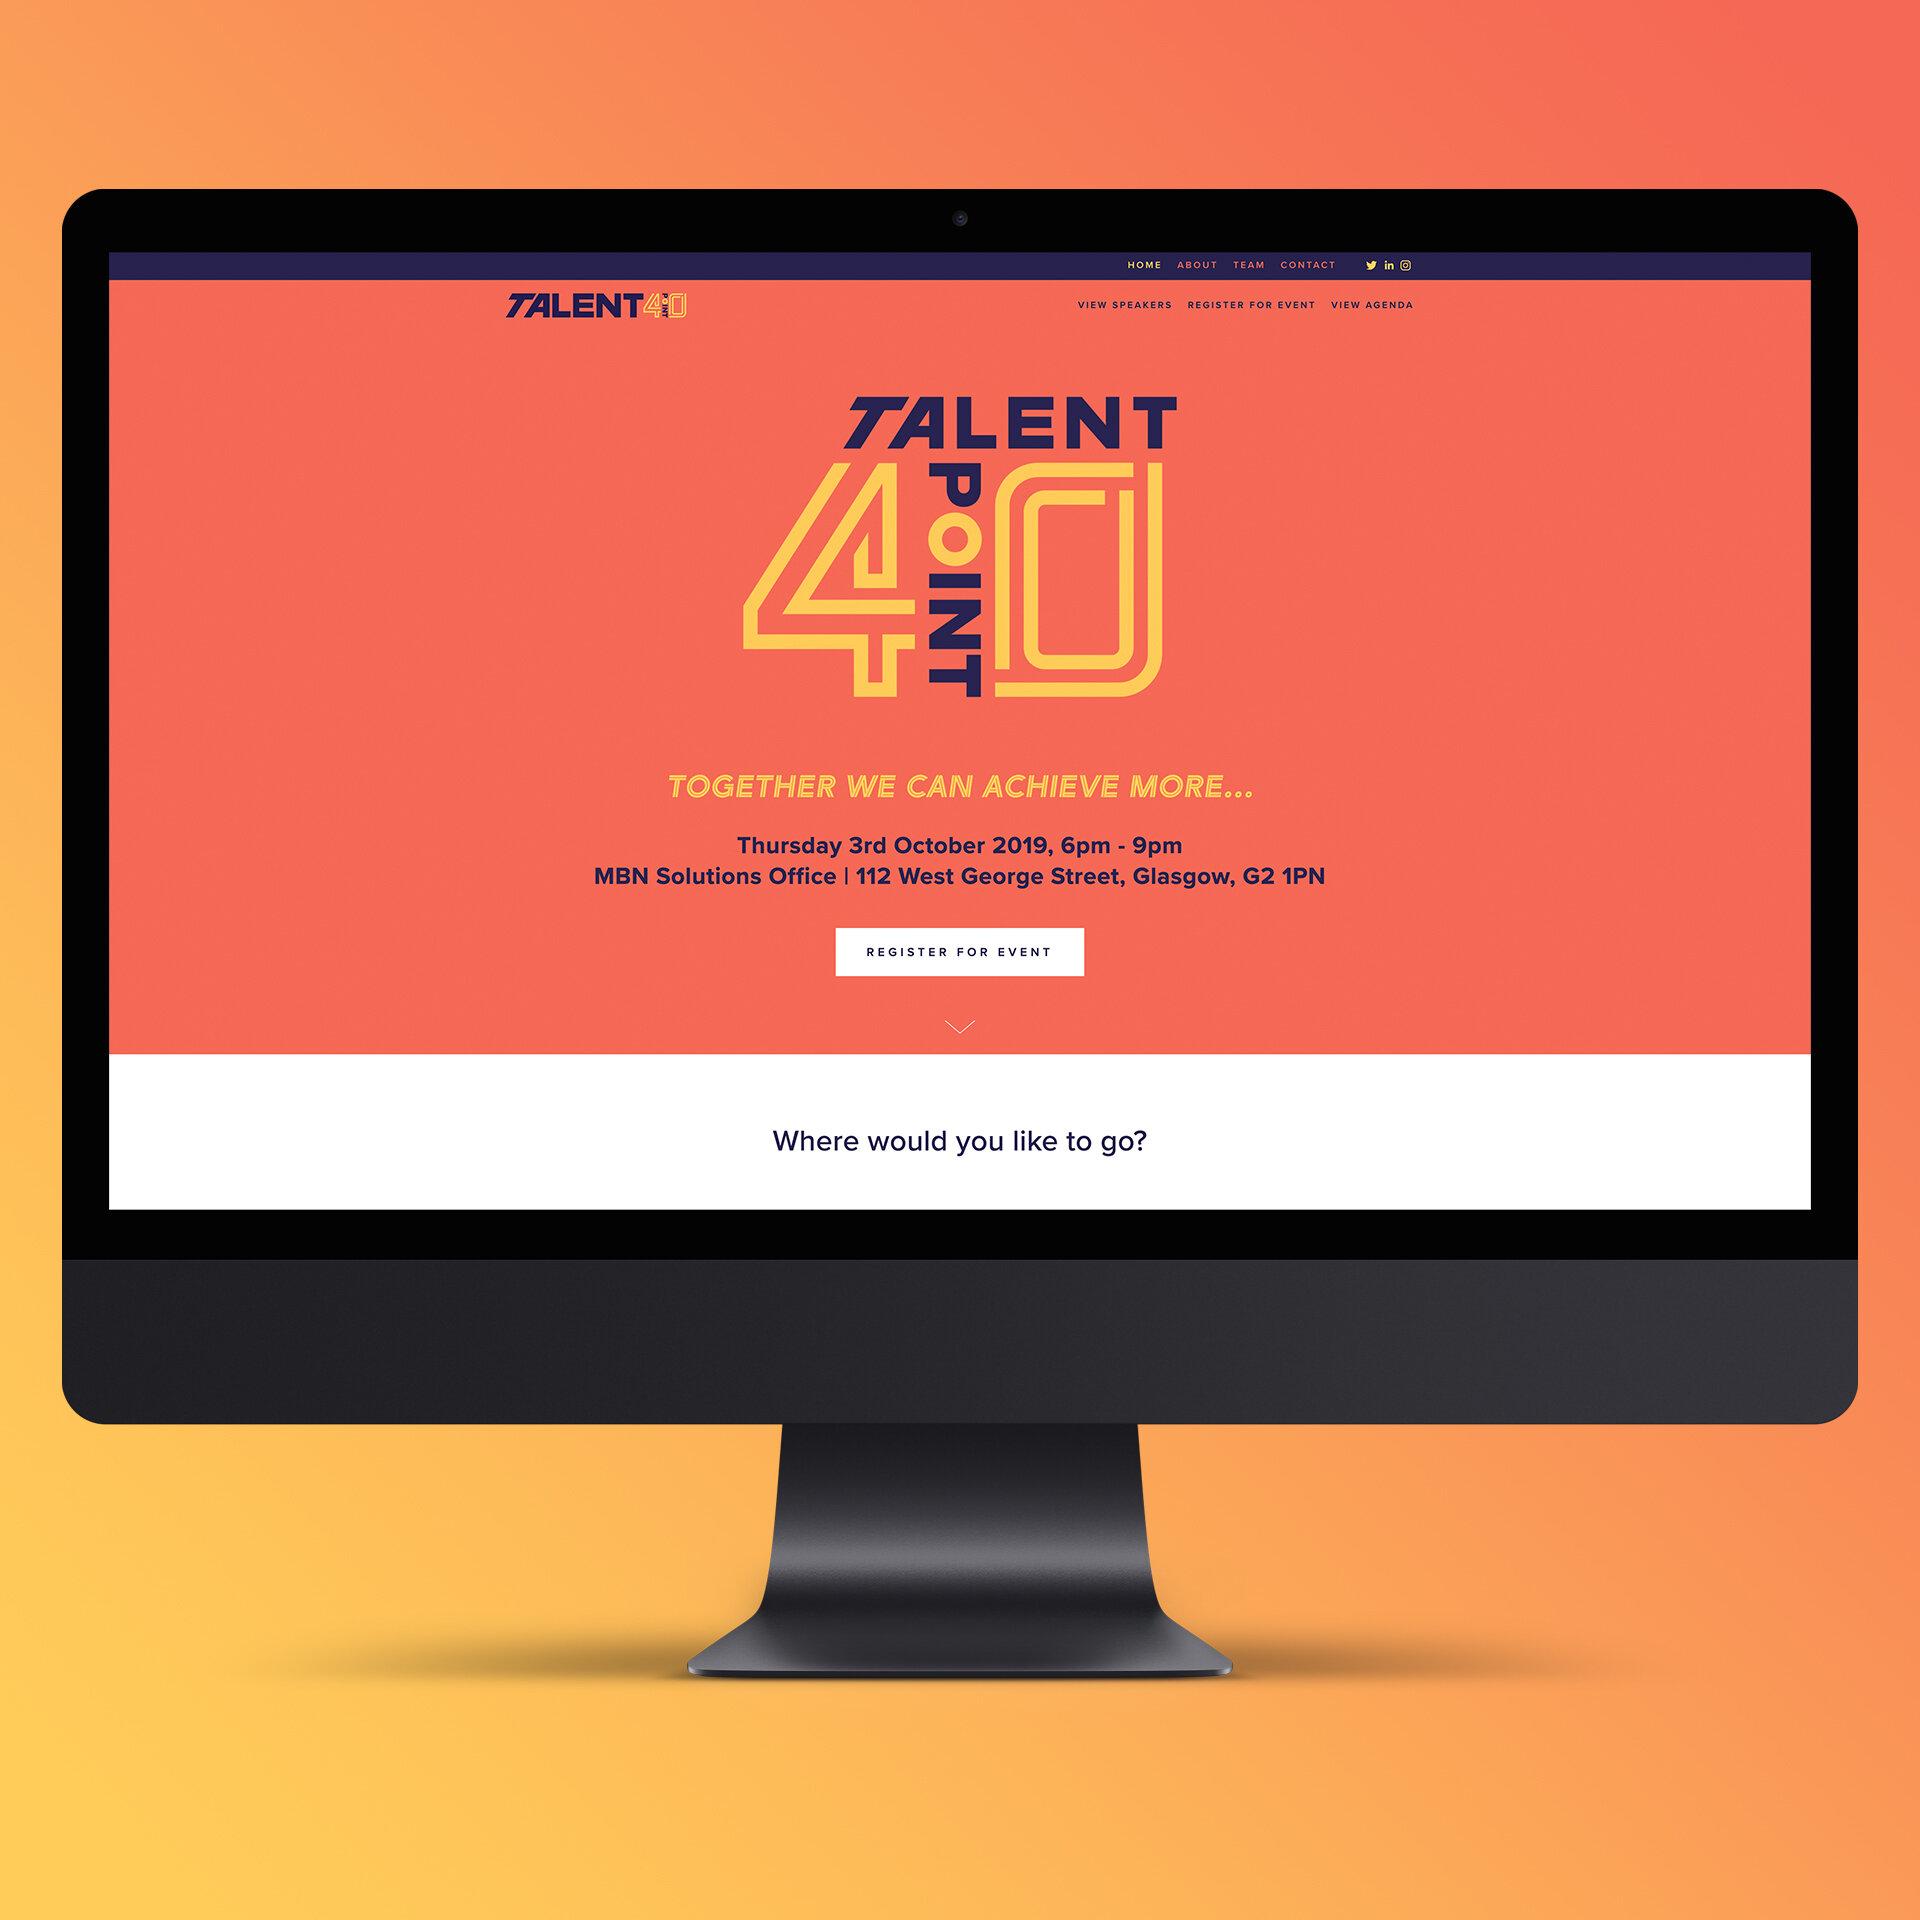 talent4point0.com